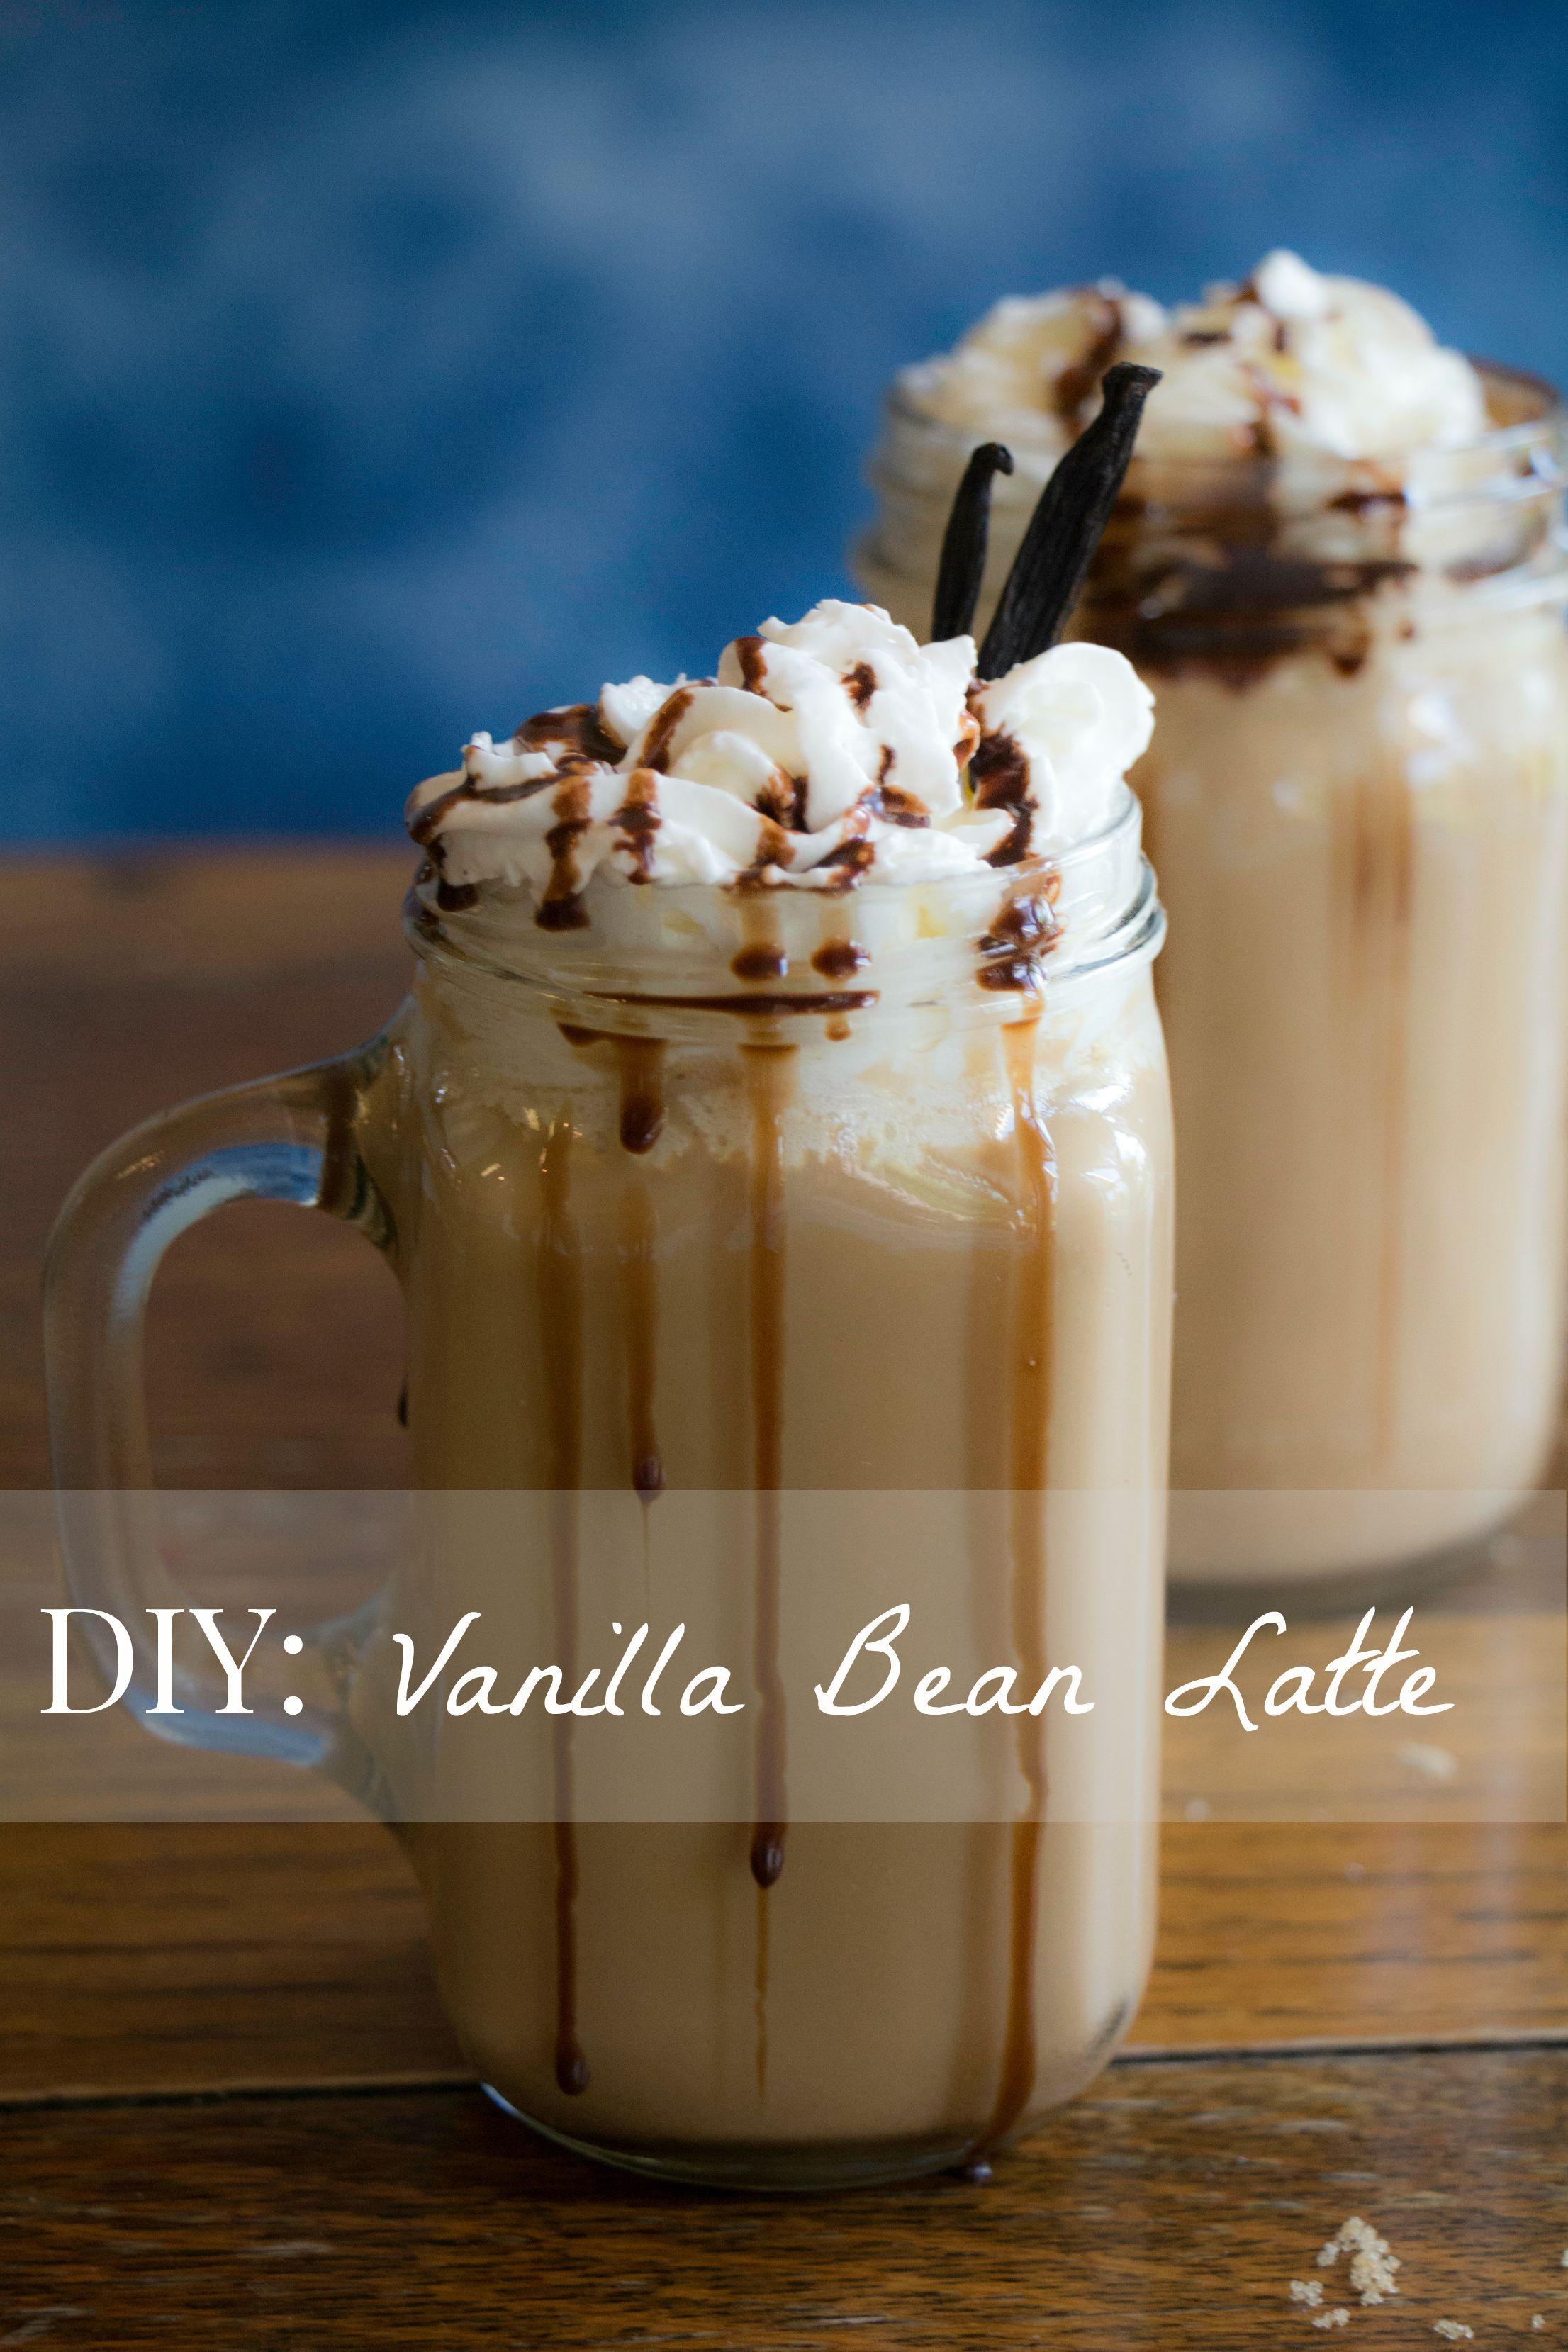 Diy vanilla bean latte latte recipe vanilla bean latte